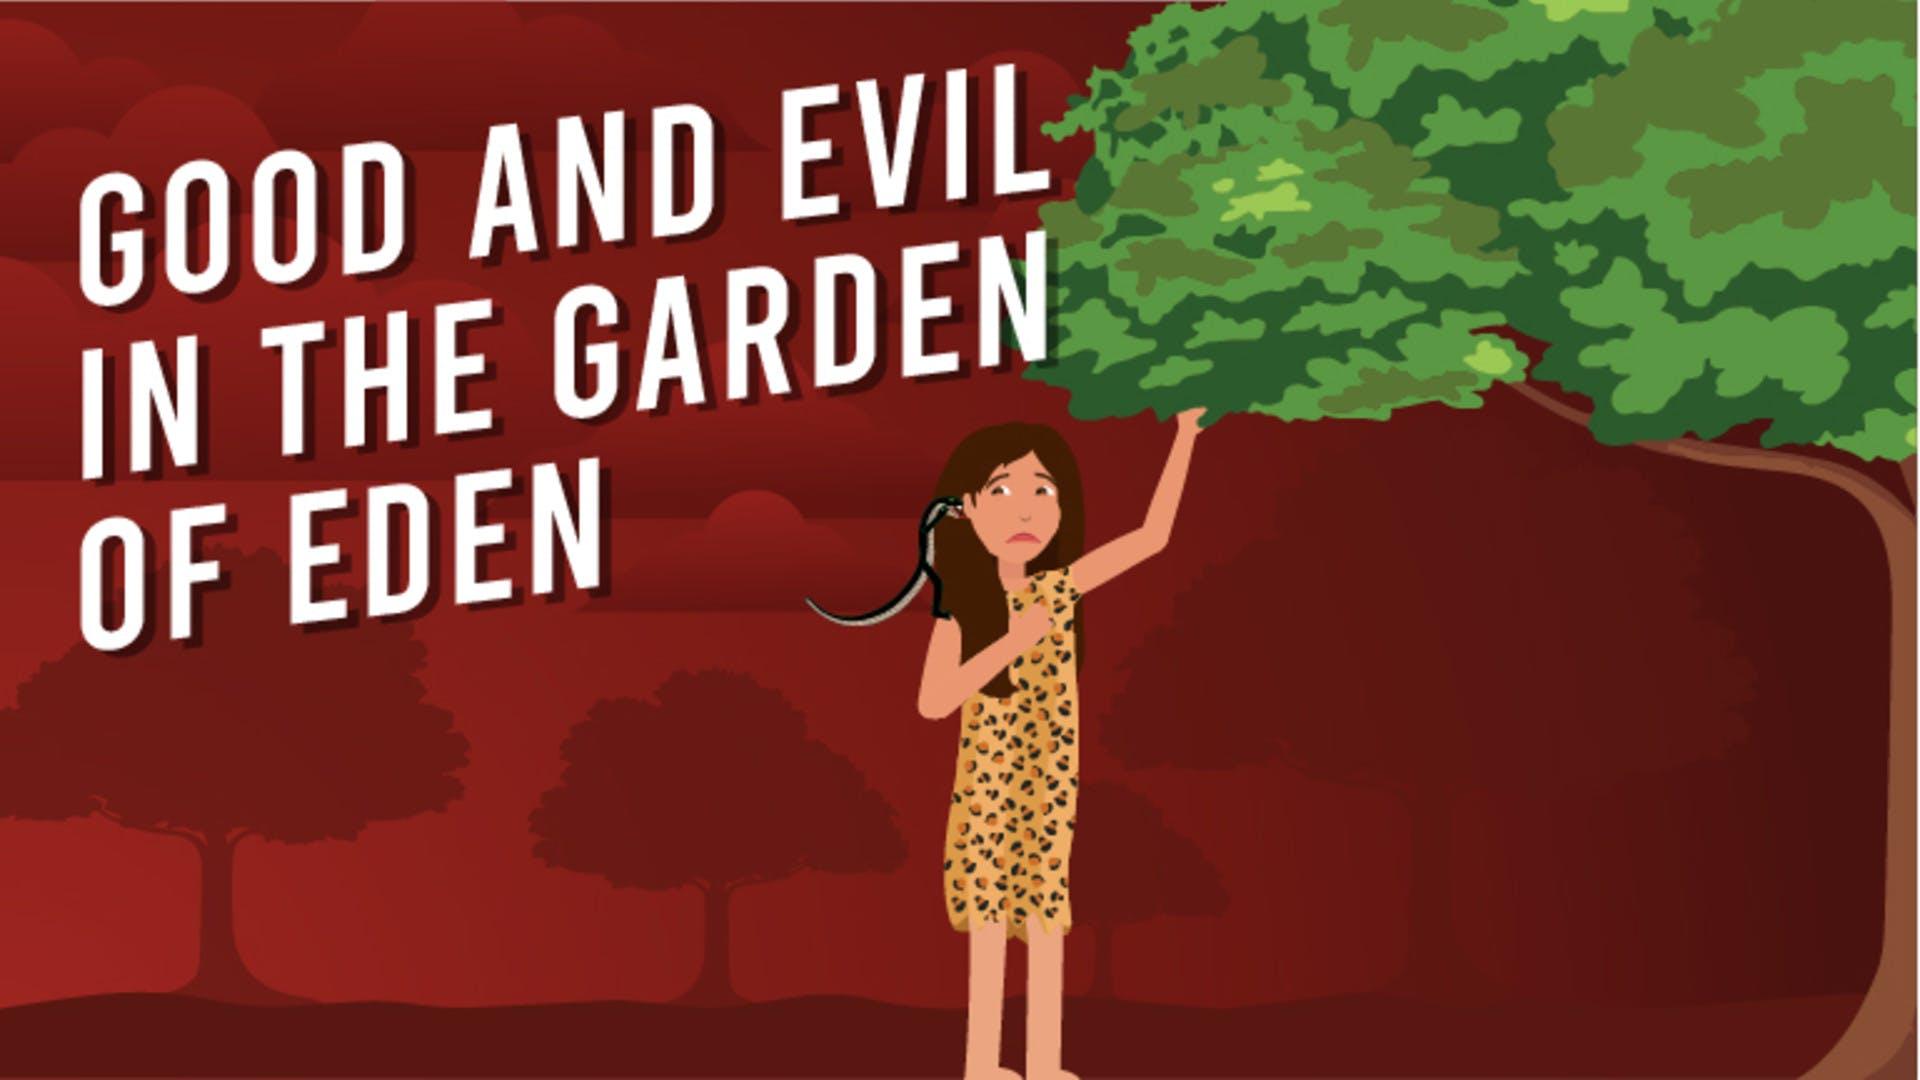 Why did God create Tree of Good Evil